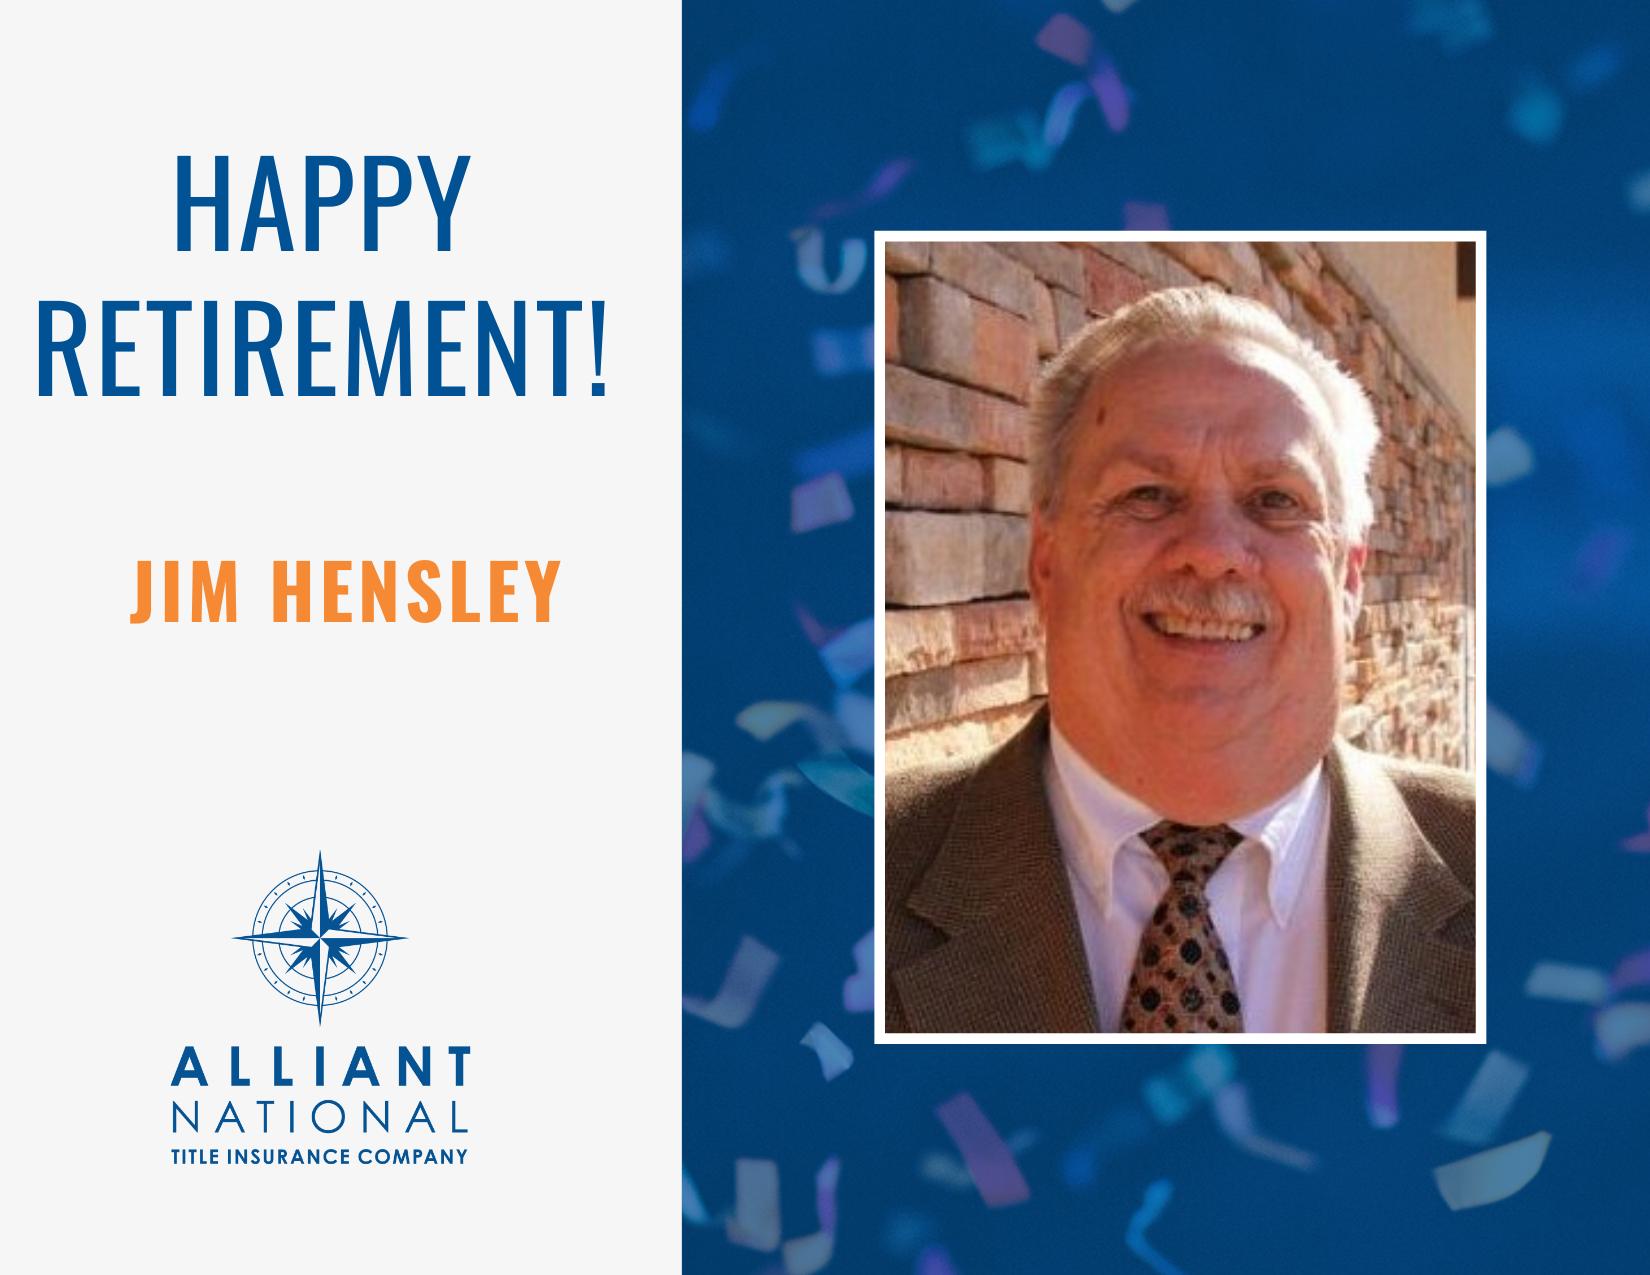 Congratulations Jim Hensley!